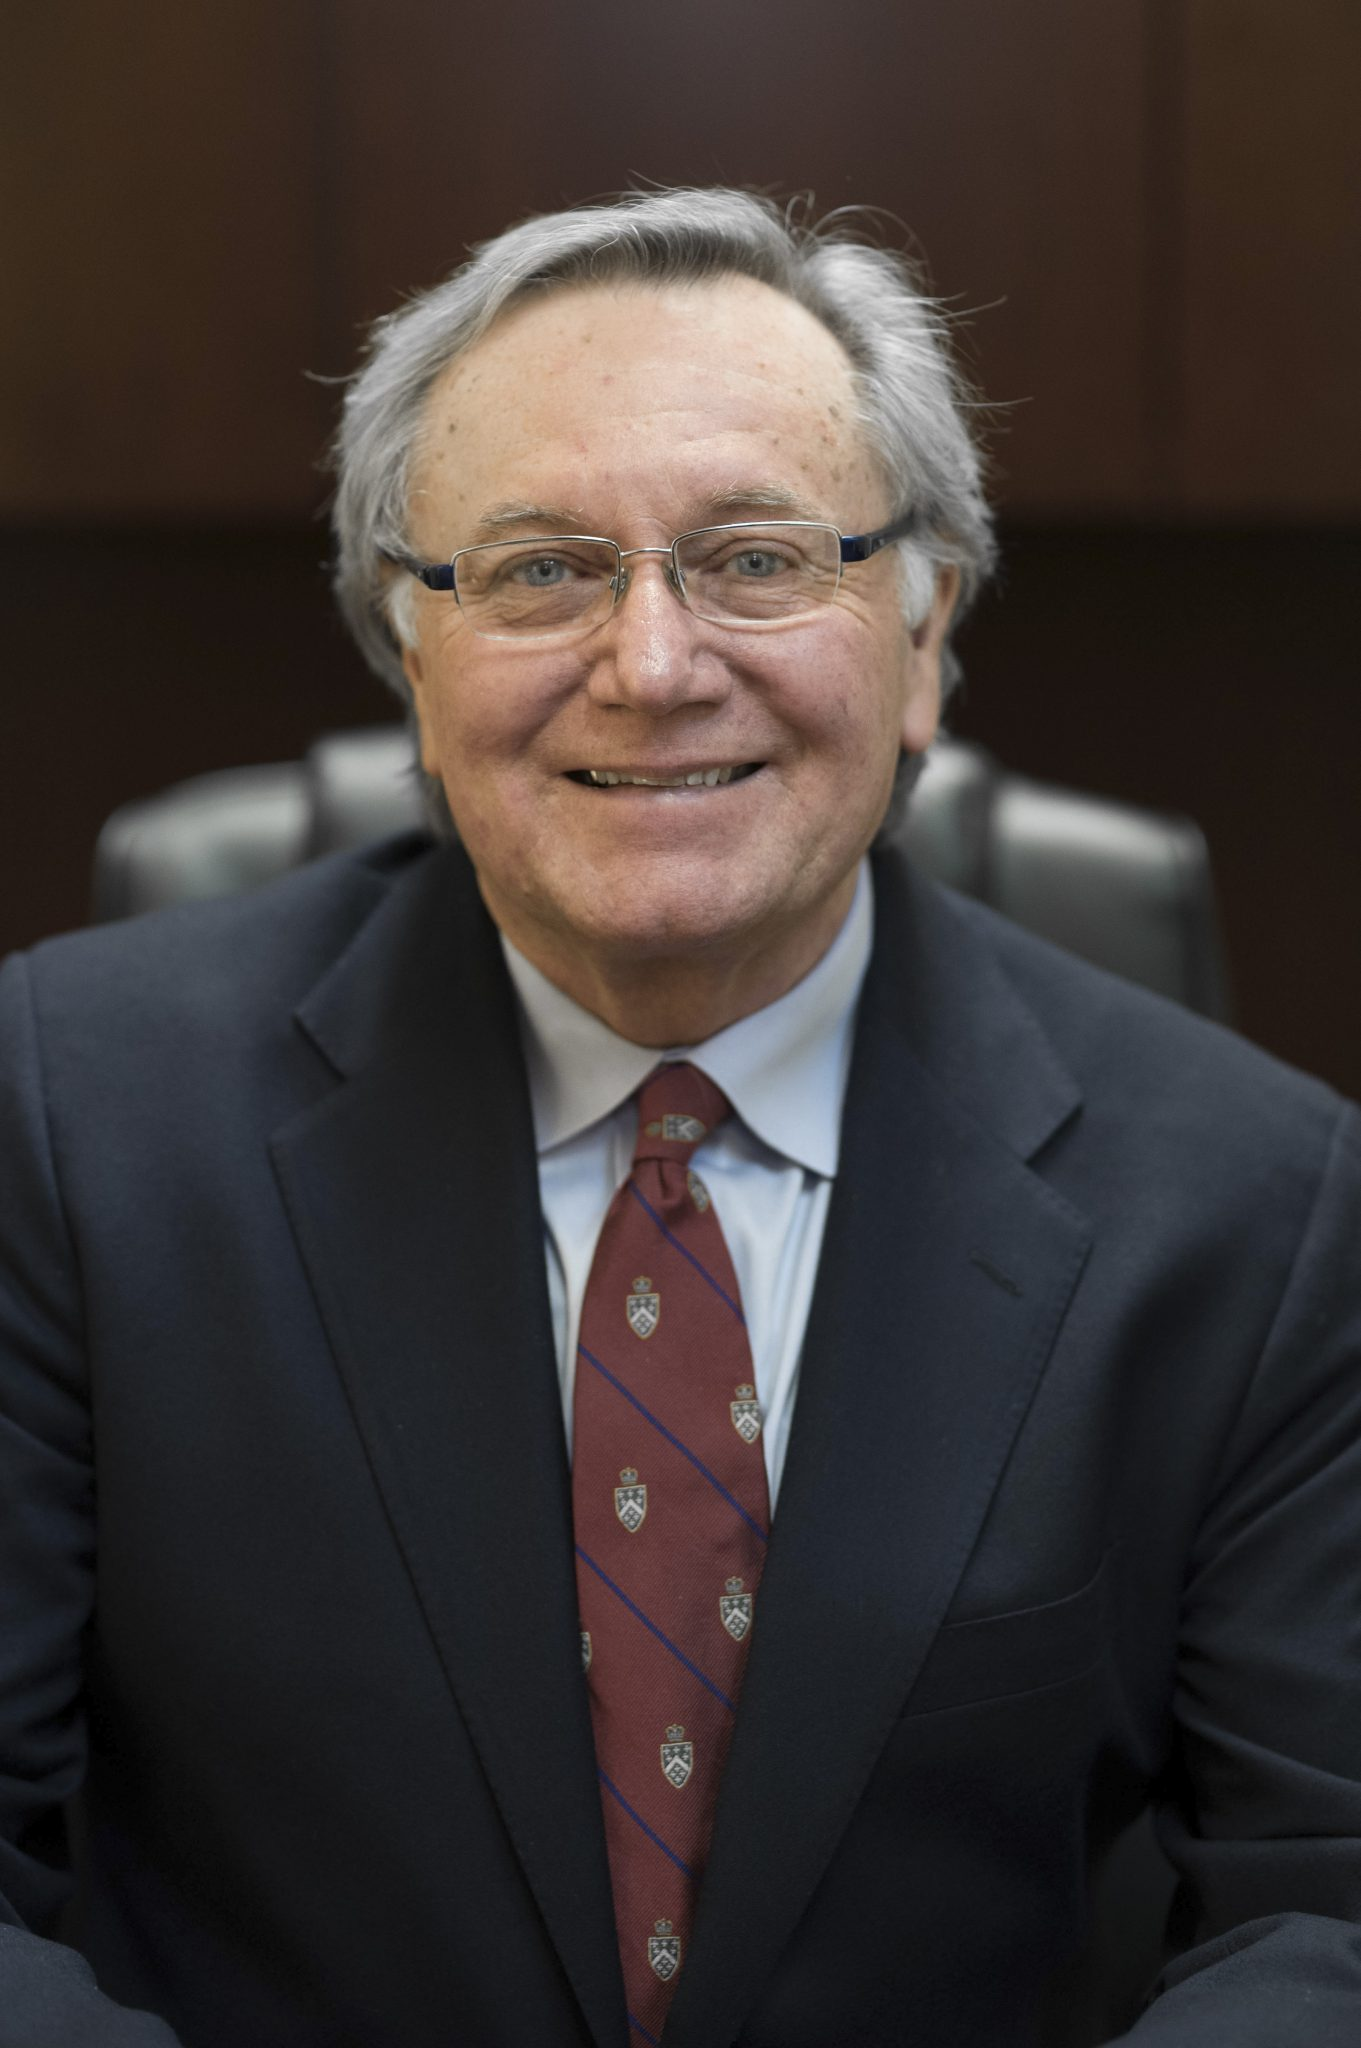 Carl Bruner, Reverse Mortgage Specialist